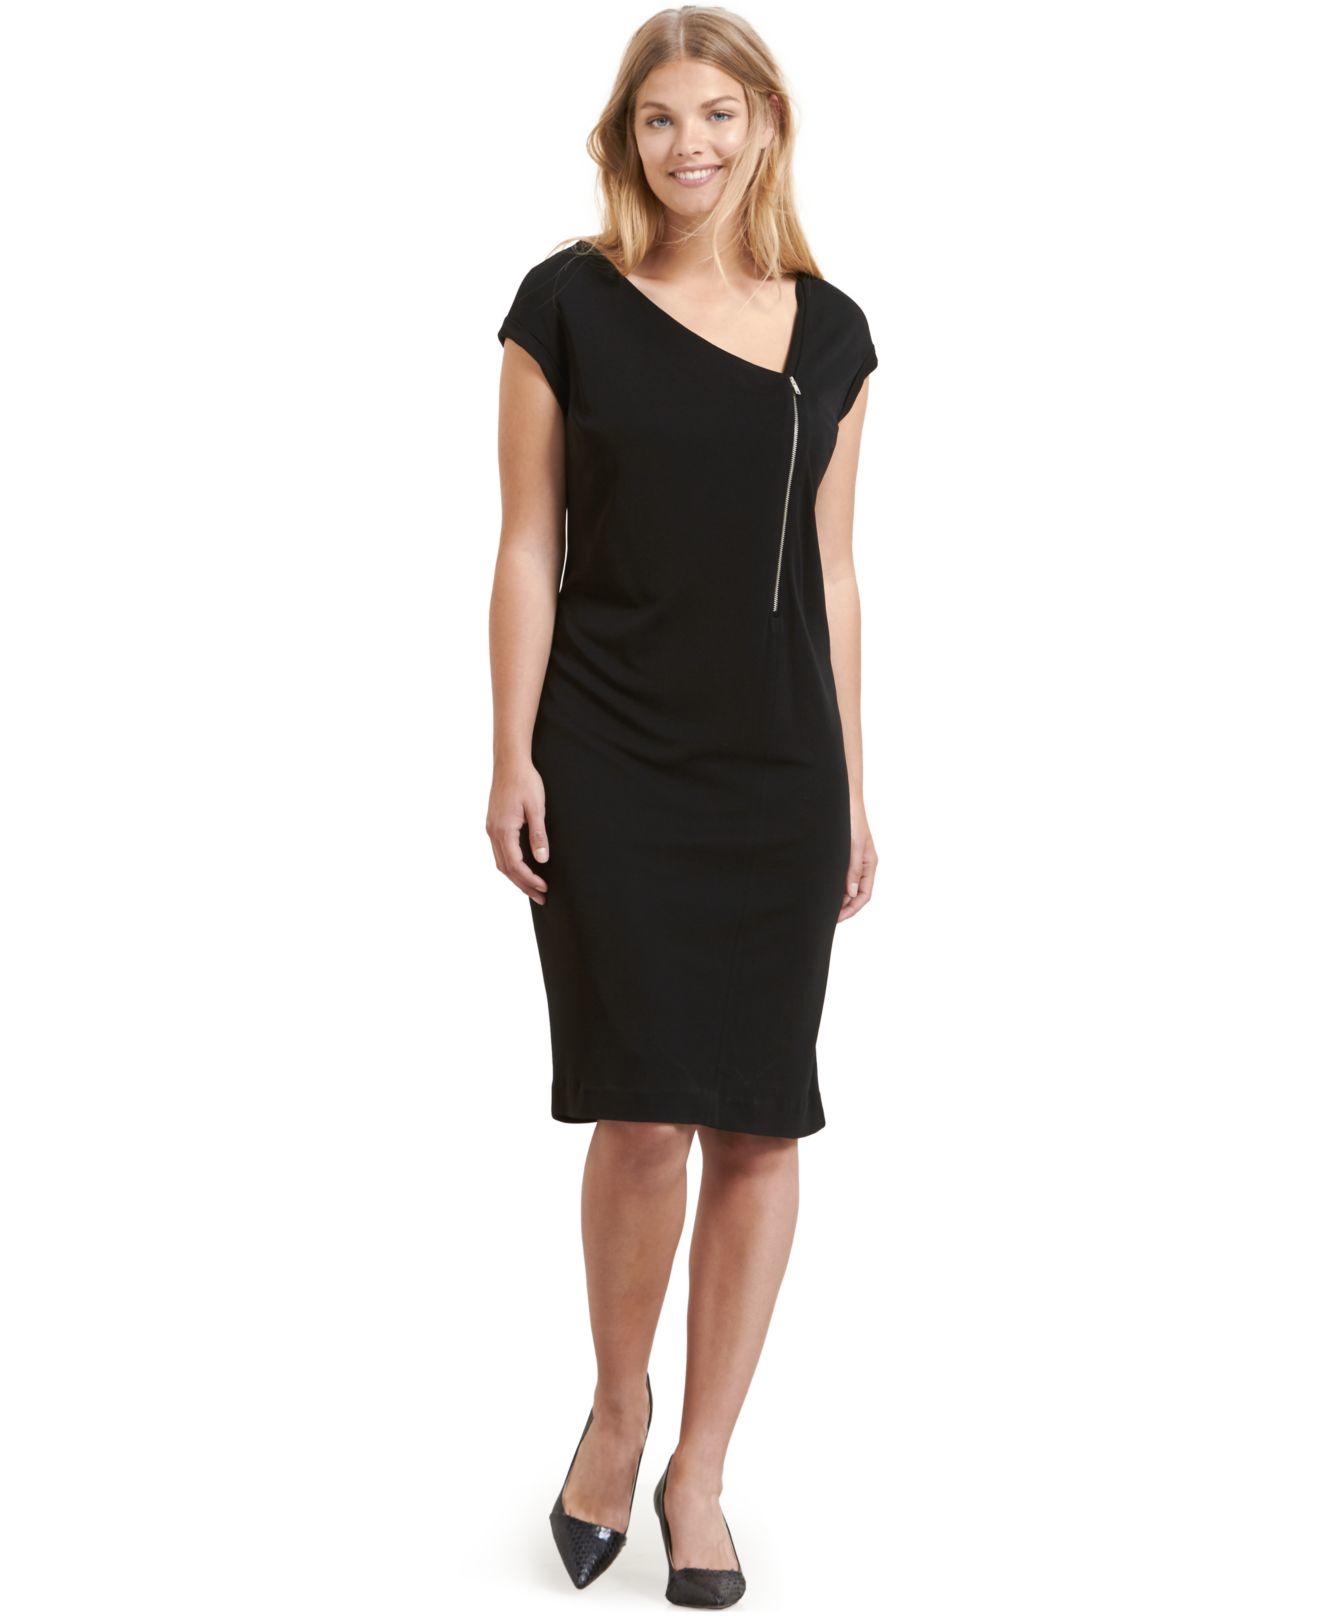 decbdcc1c19 Lyst - Violeta by Mango Plus Size Zip-front Sheath Dress in Black